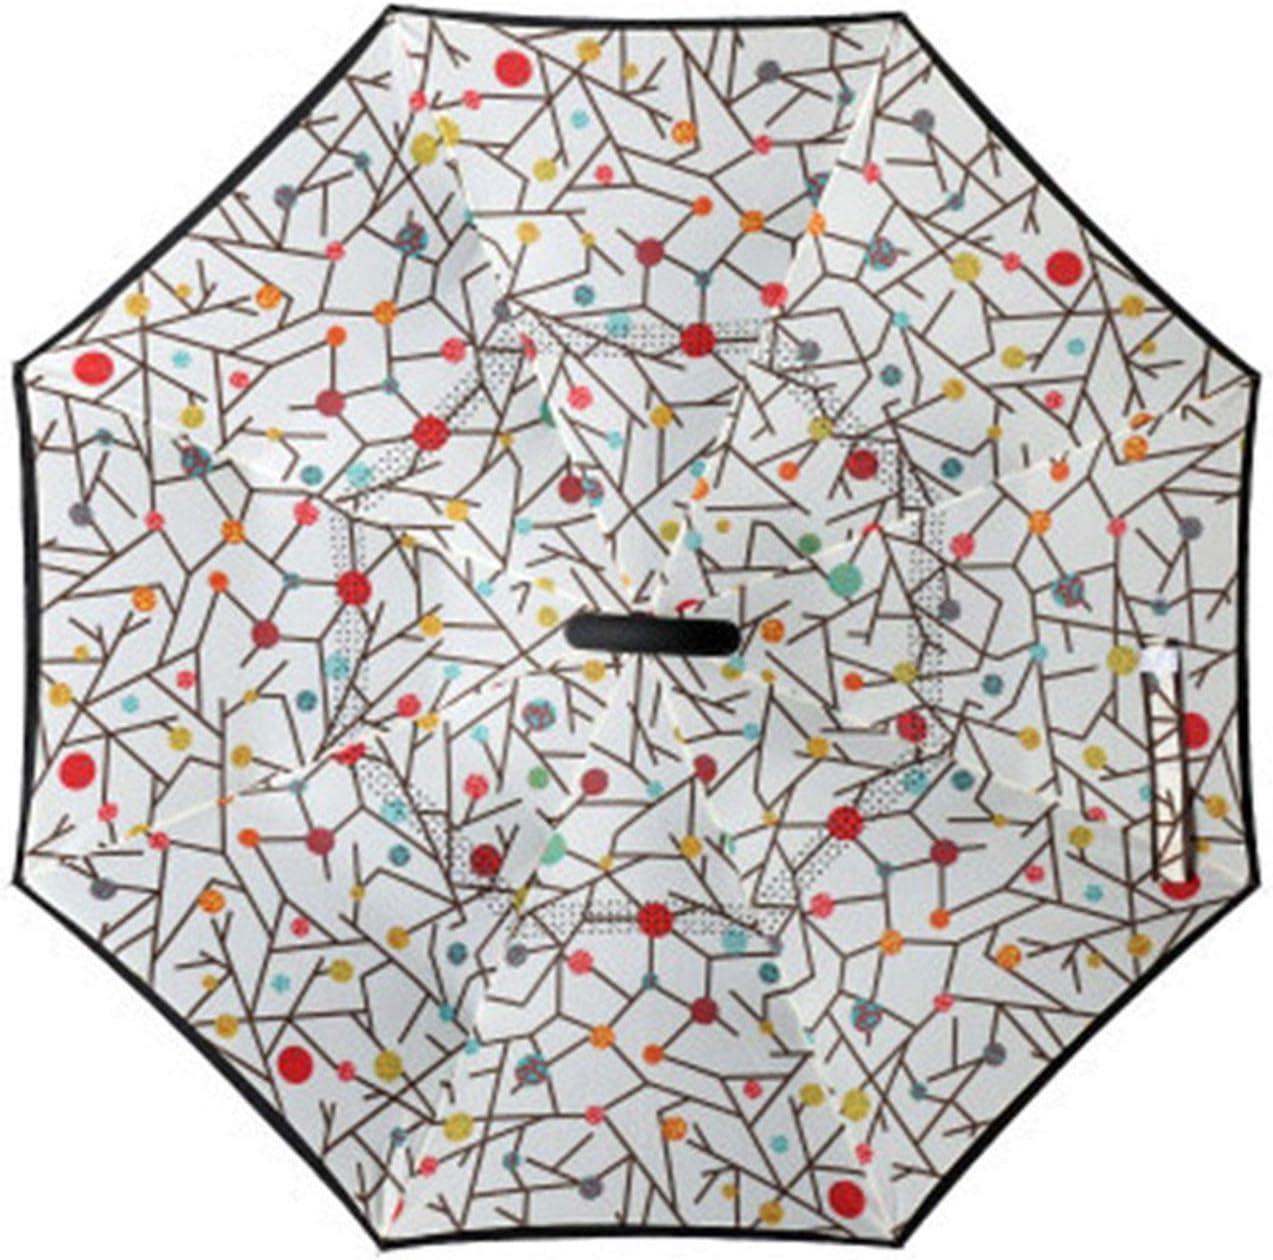 2019 Folding Long Shank Double Layer Inverted Umbrella Windproof Reverse C-Hook male reverse Umbrellas,15